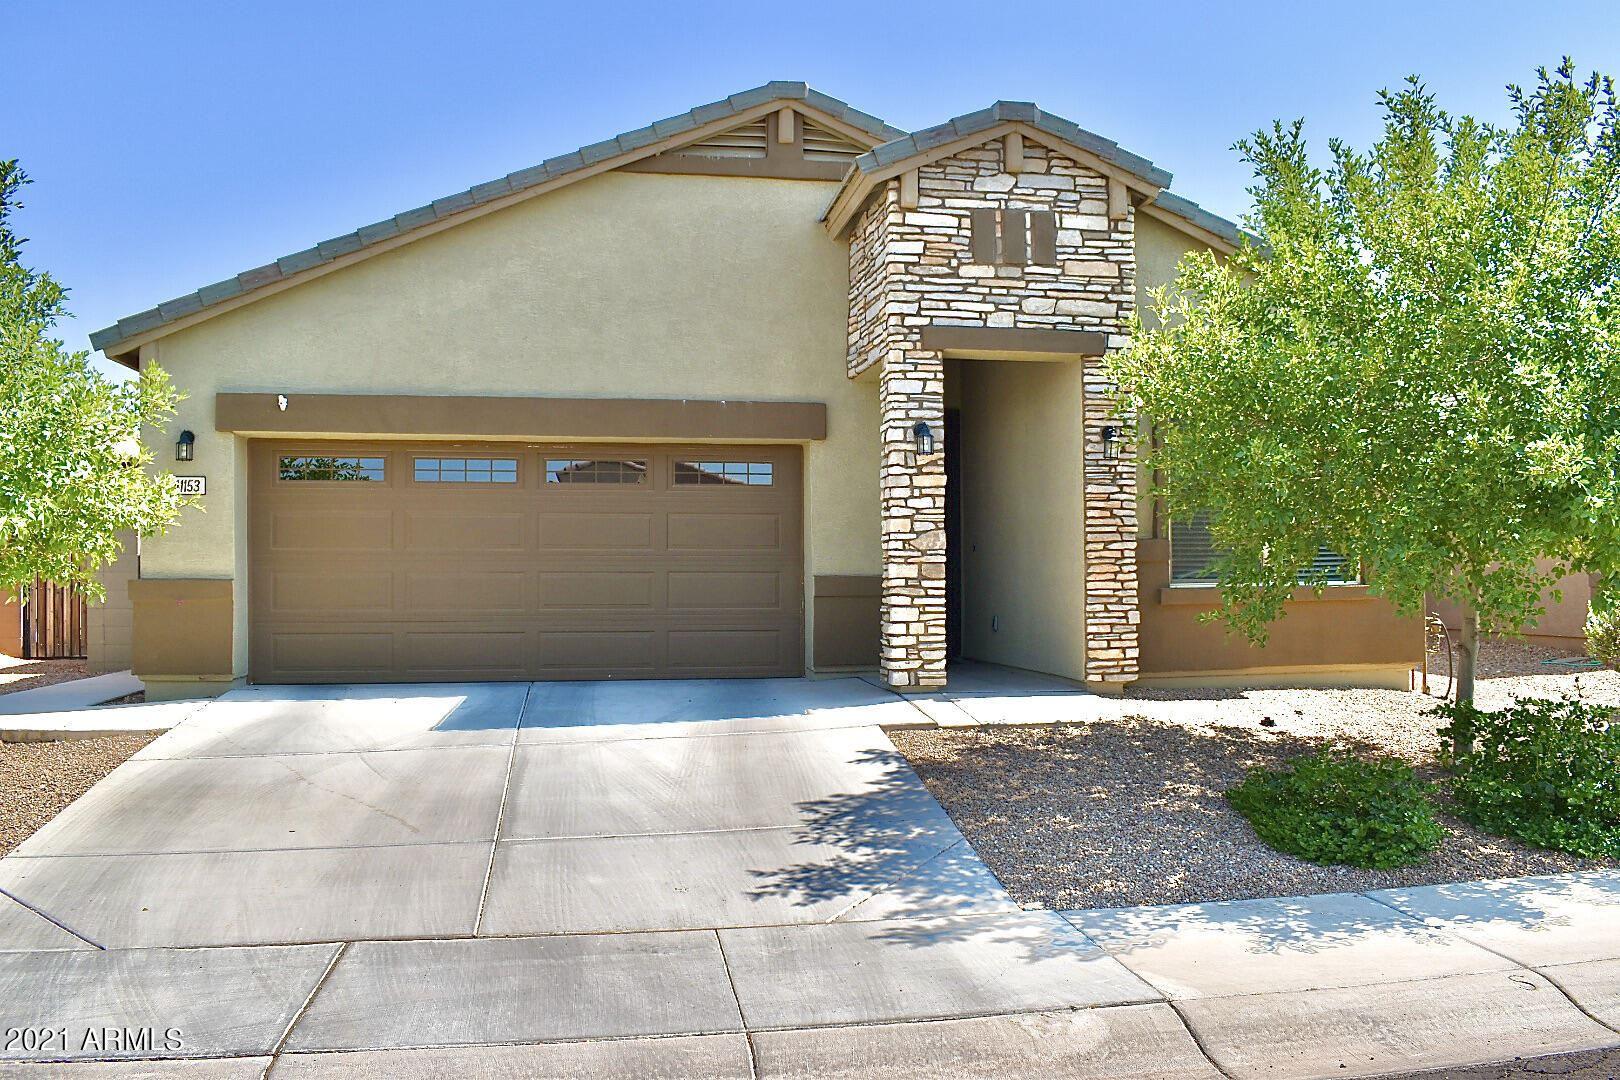 Photo for 41153 W GANLEY Way, Maricopa, AZ 85138 (MLS # 6247016)